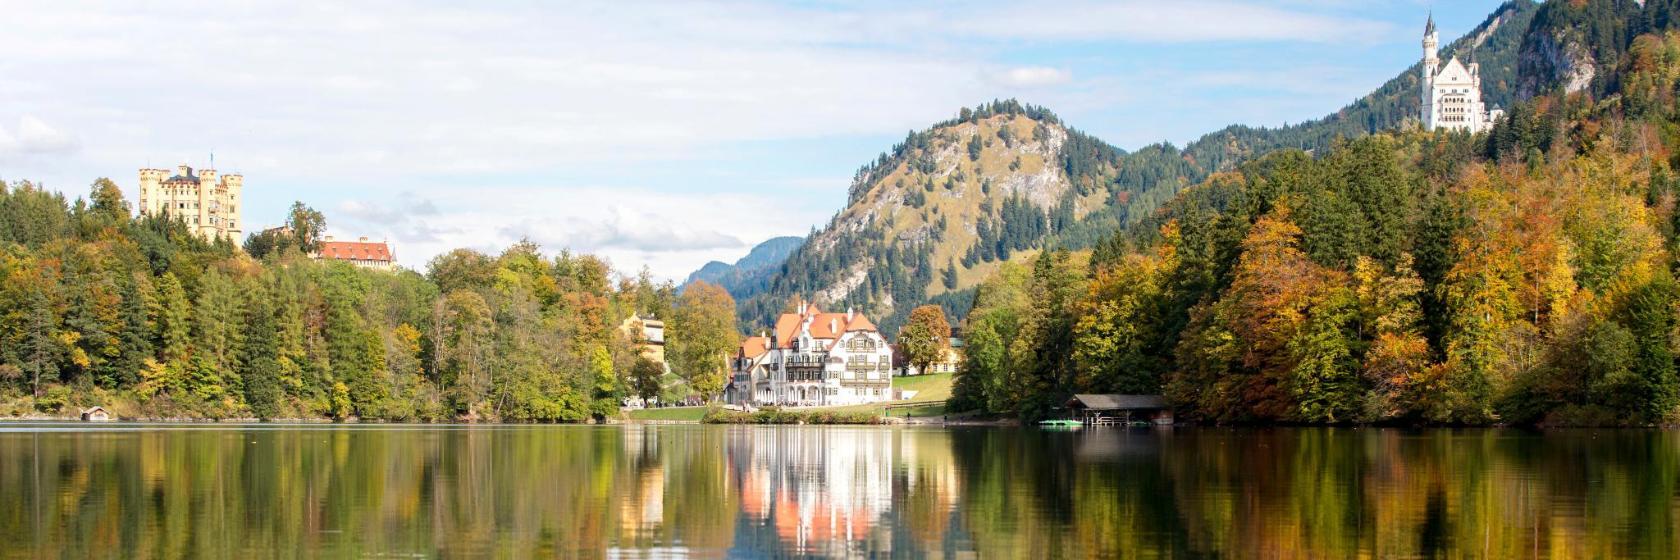 urlaub vulkaneifel hotels mit hallenbad